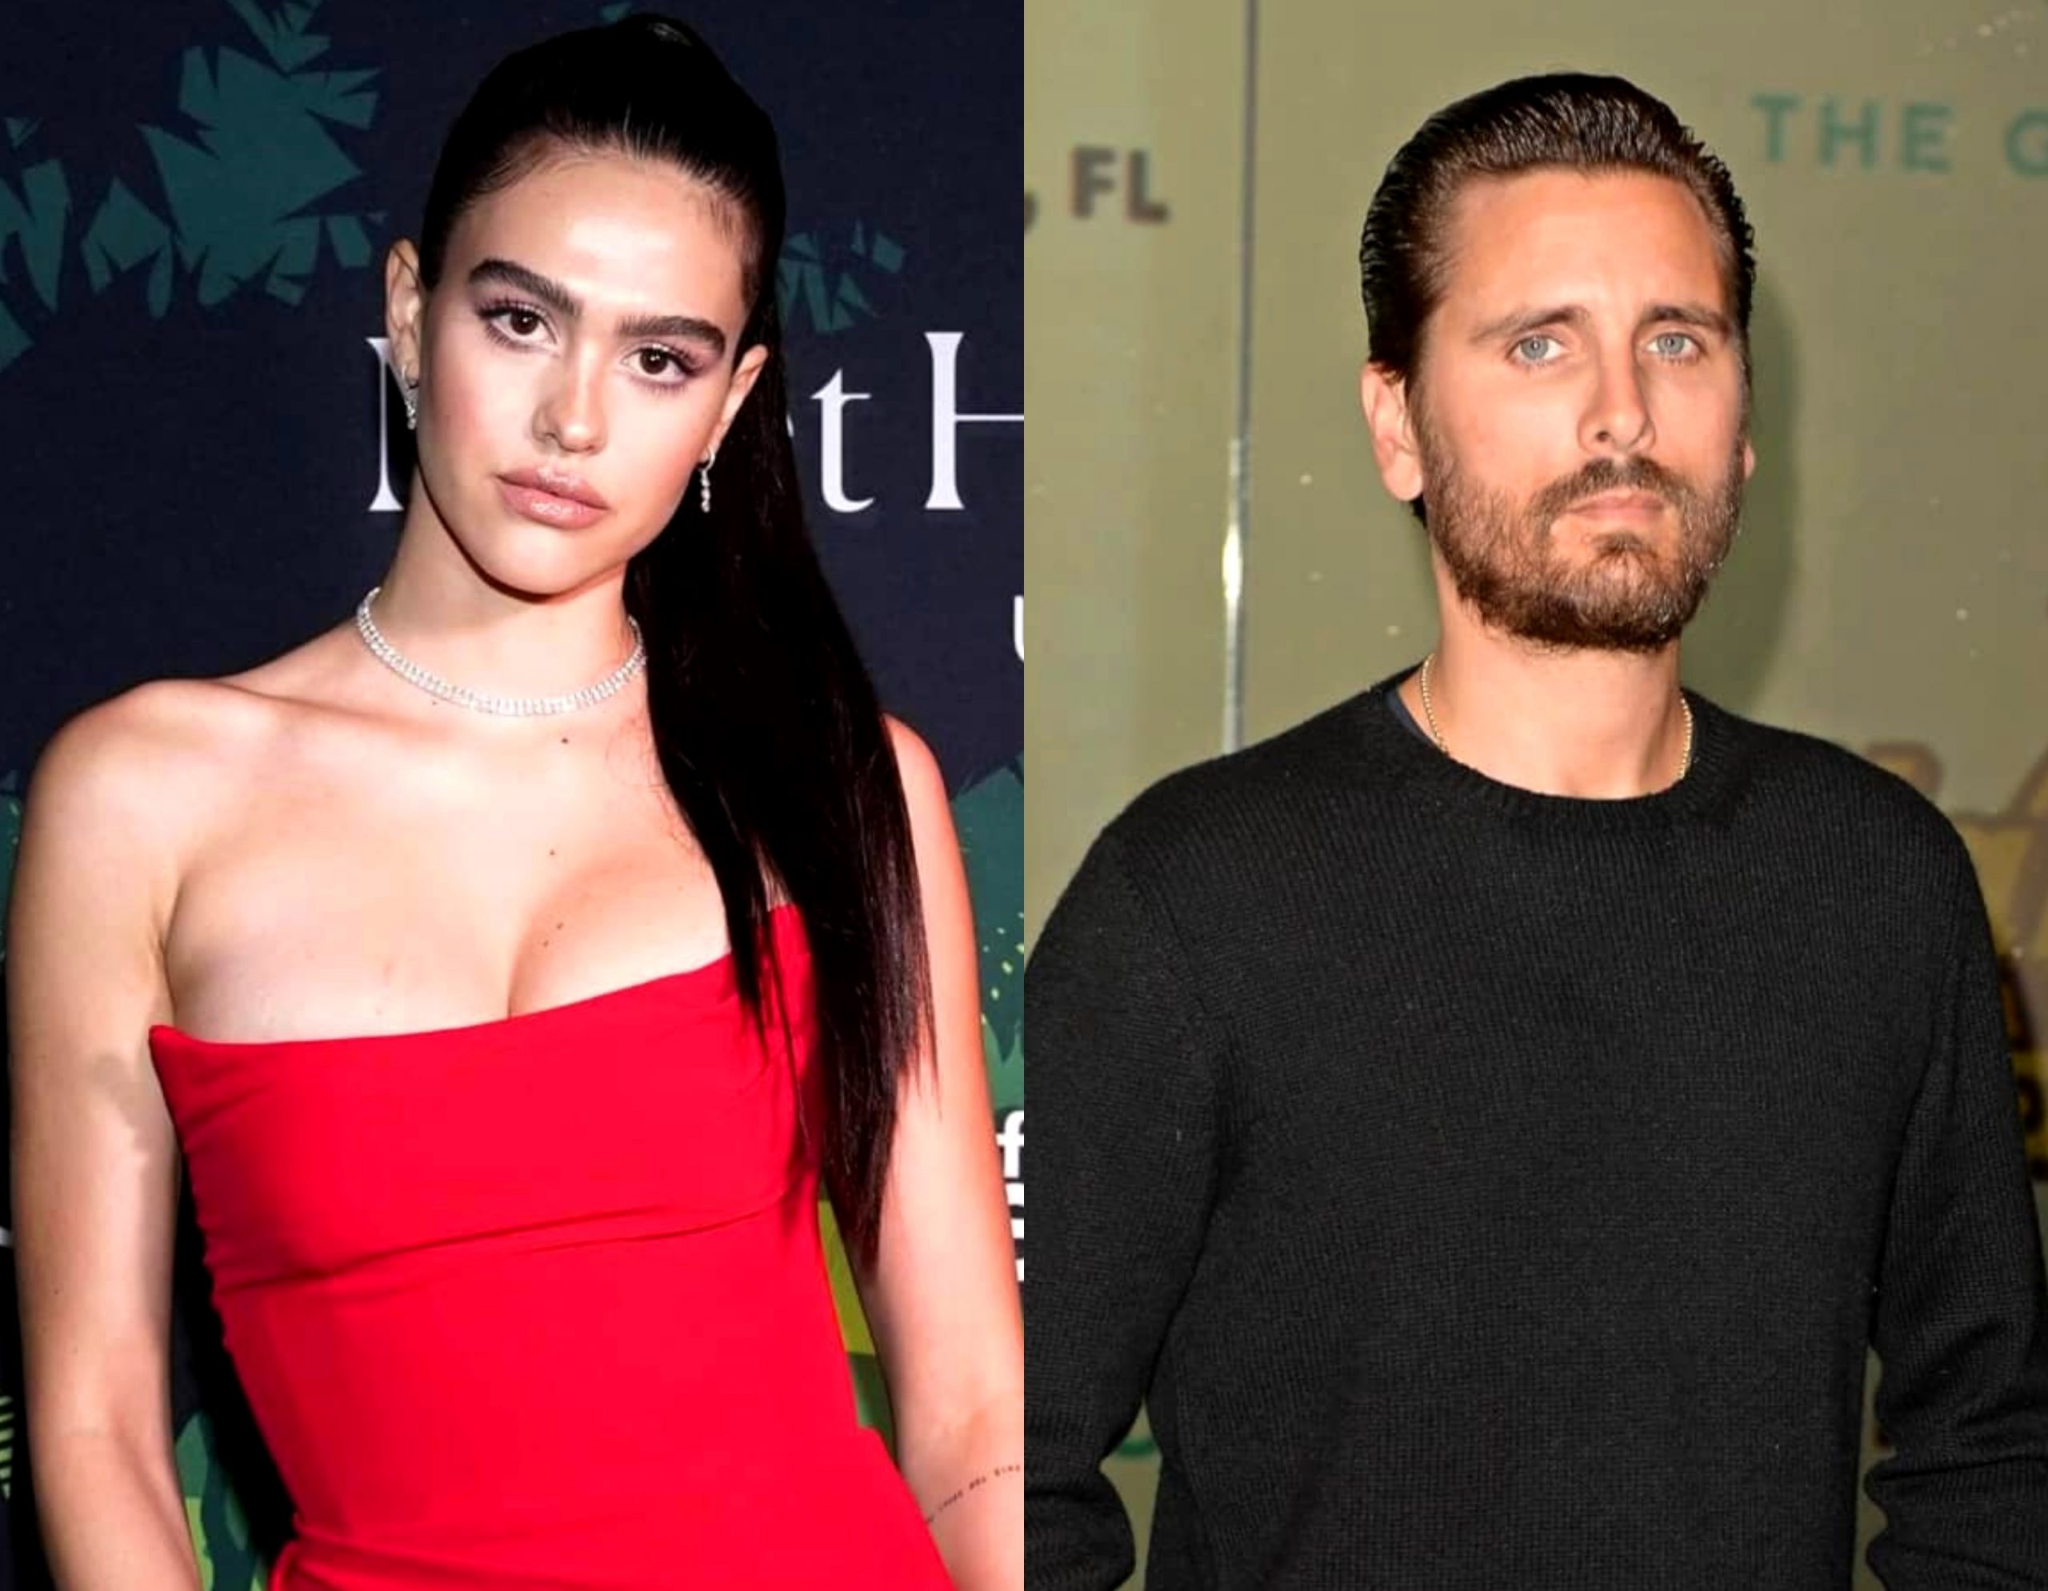 "Amelia Hamlin and Scott Disick Taking Time Apart Amid ""Rough Patch"" Following DM Drama With Kourtney Kardashian, Plus She Wears Shady T-Shirt"